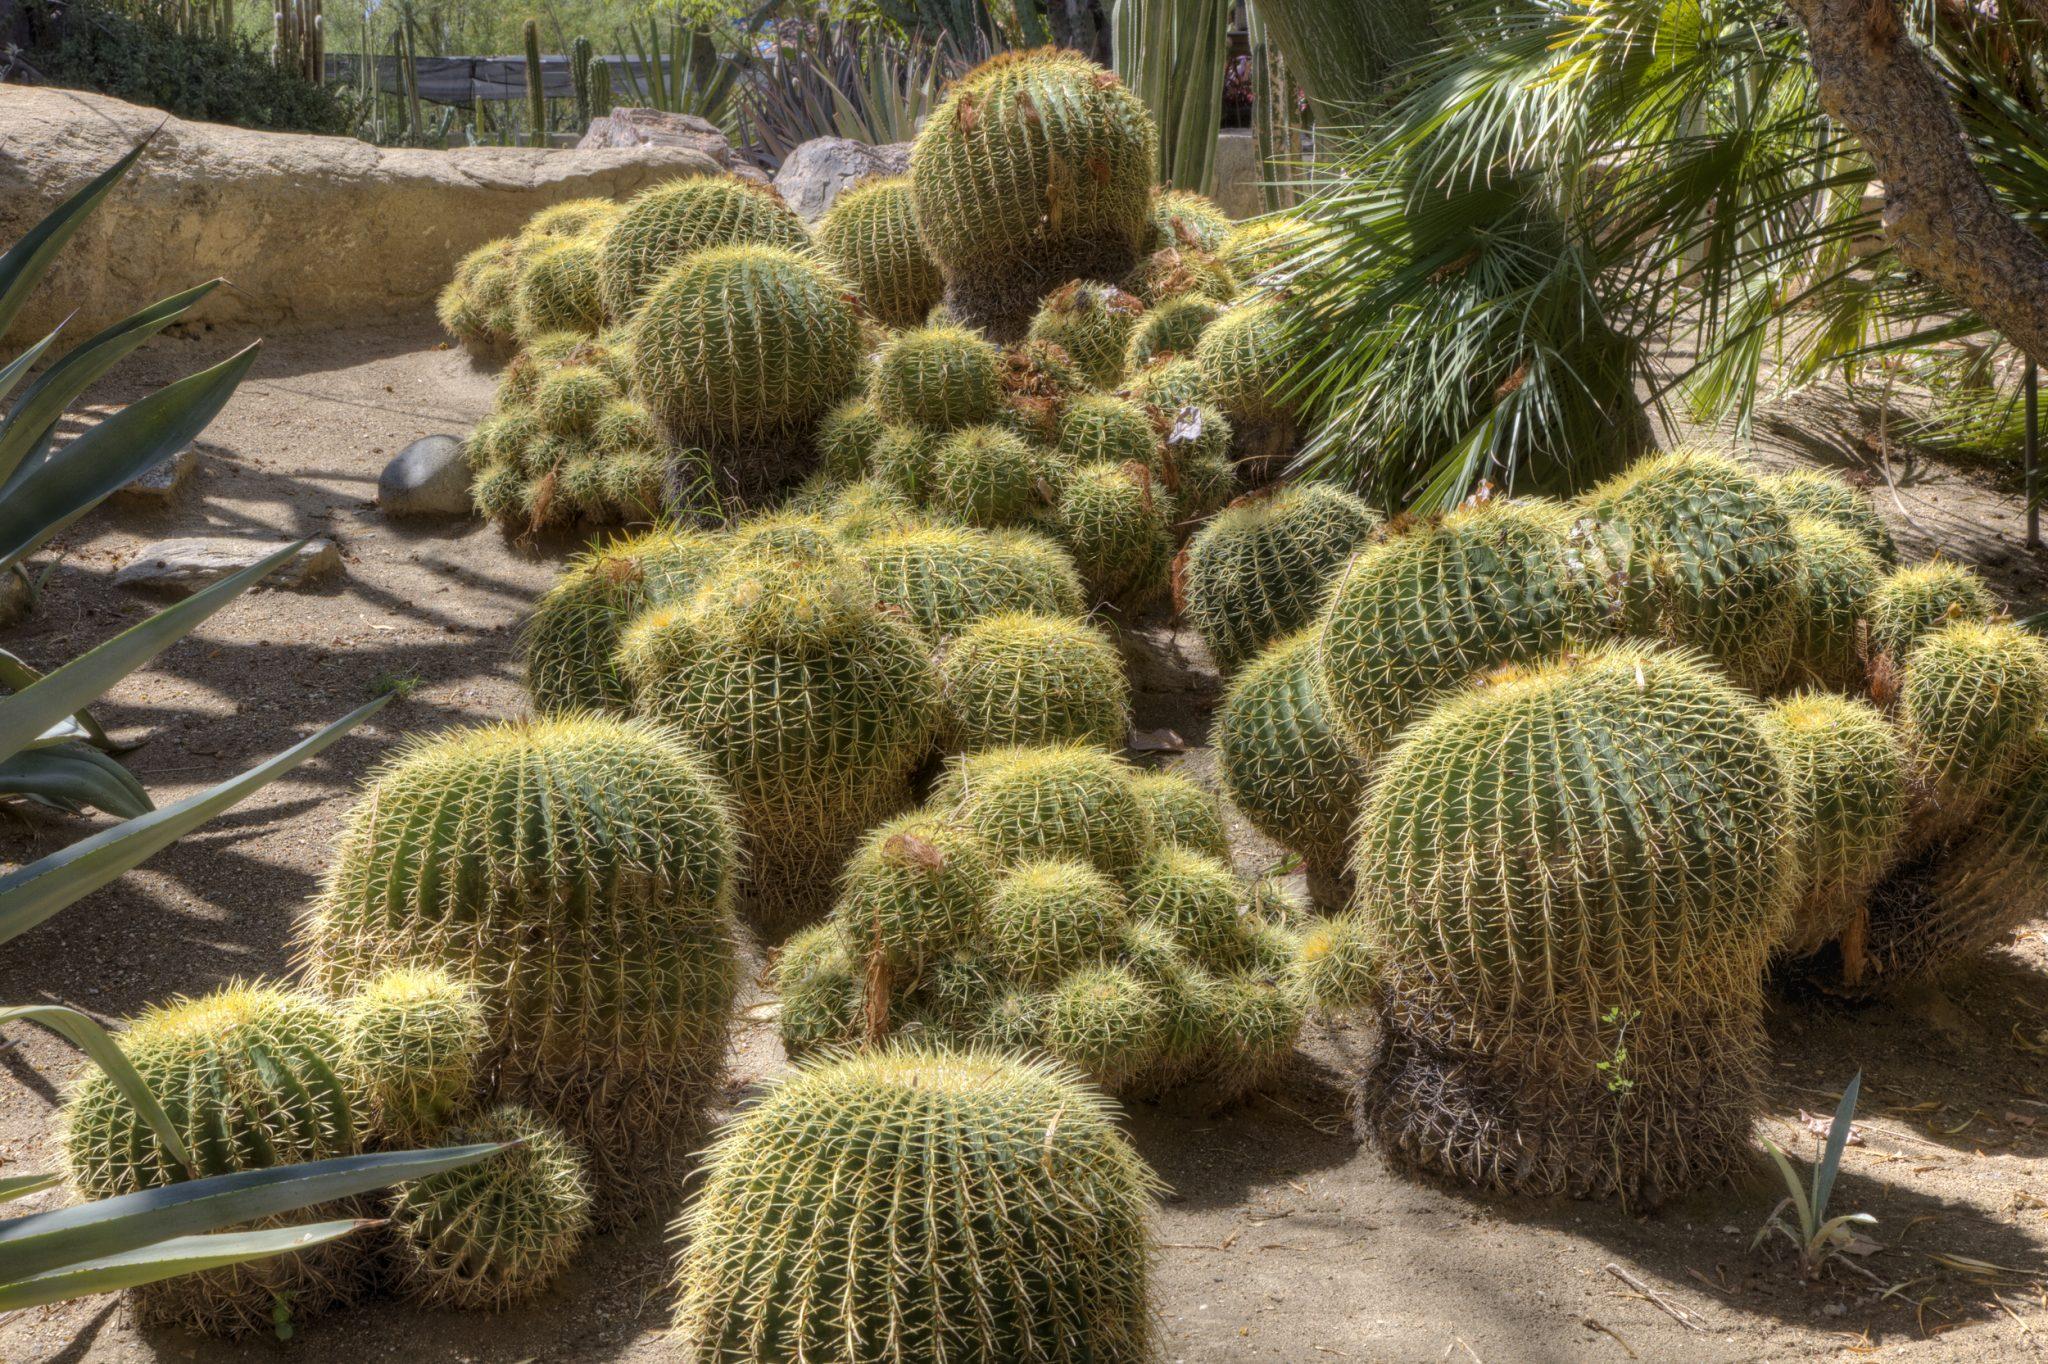 Botanical Gardens in Orange County